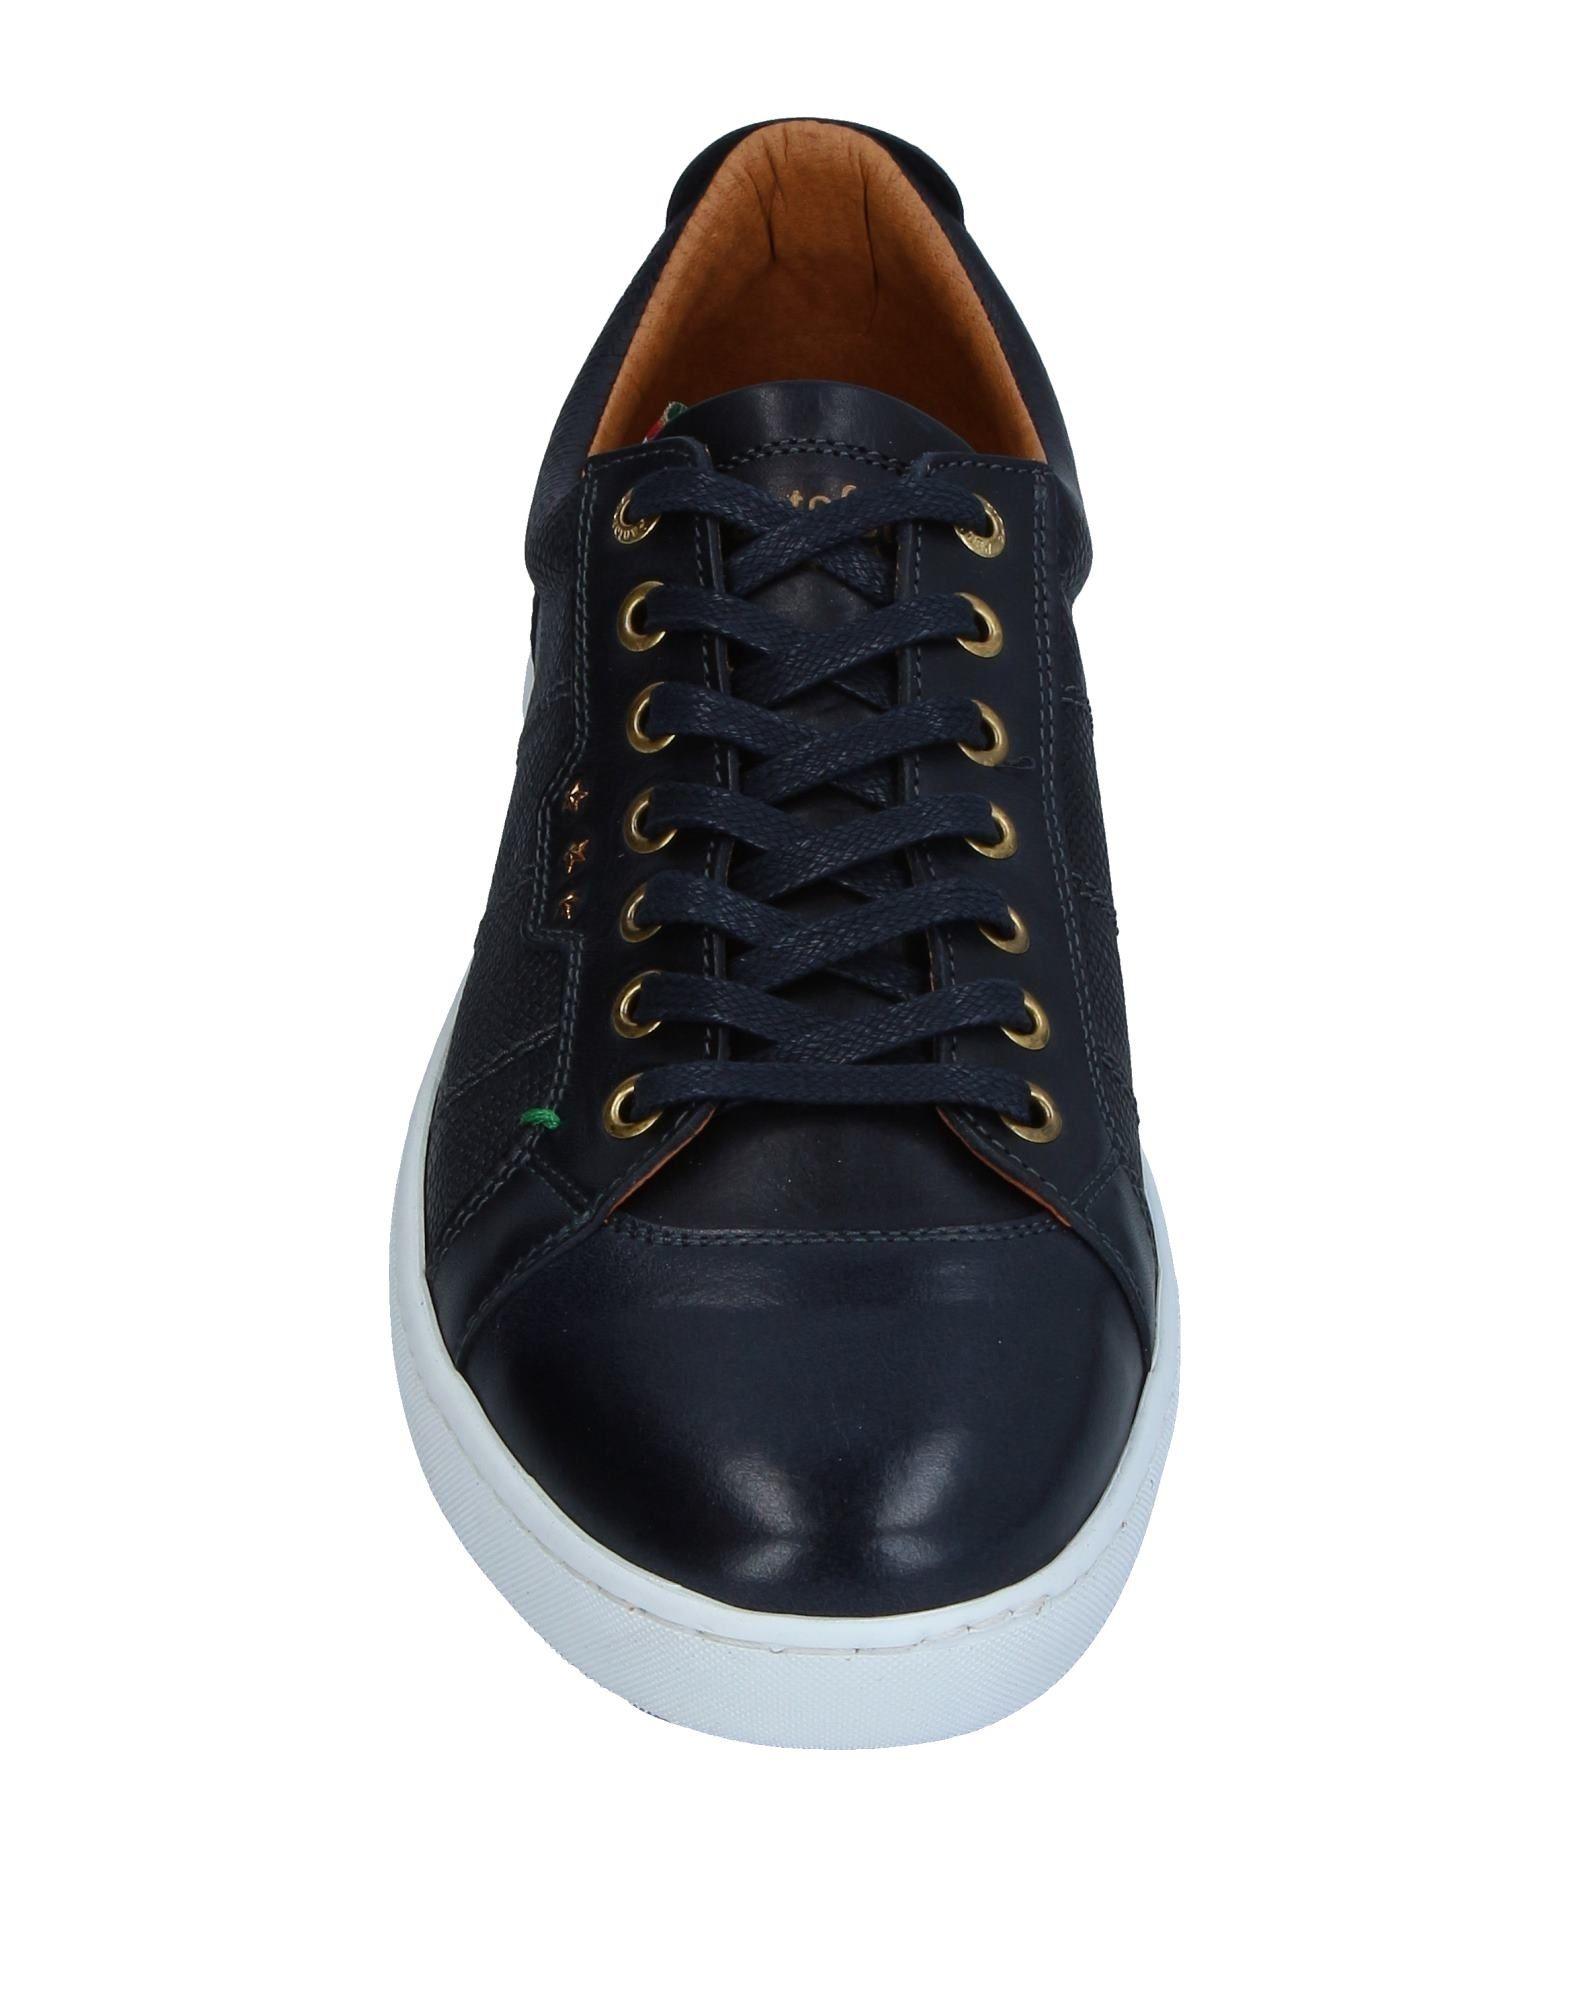 Pantofola Neue D'oro Sneakers Herren  11338533GR Neue Pantofola Schuhe 55beaa